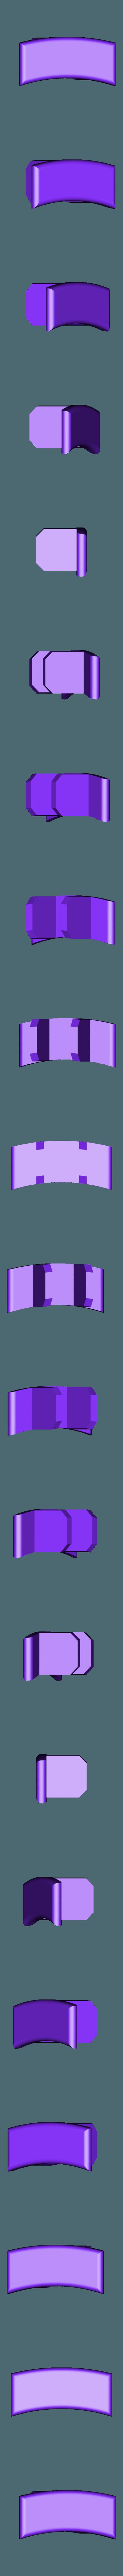 Clip.stl Download free STL file Little MasterSpool Roller + Sticker (fixed stl, multiple versions, including sourcefile) • 3D print template, kleinerELM